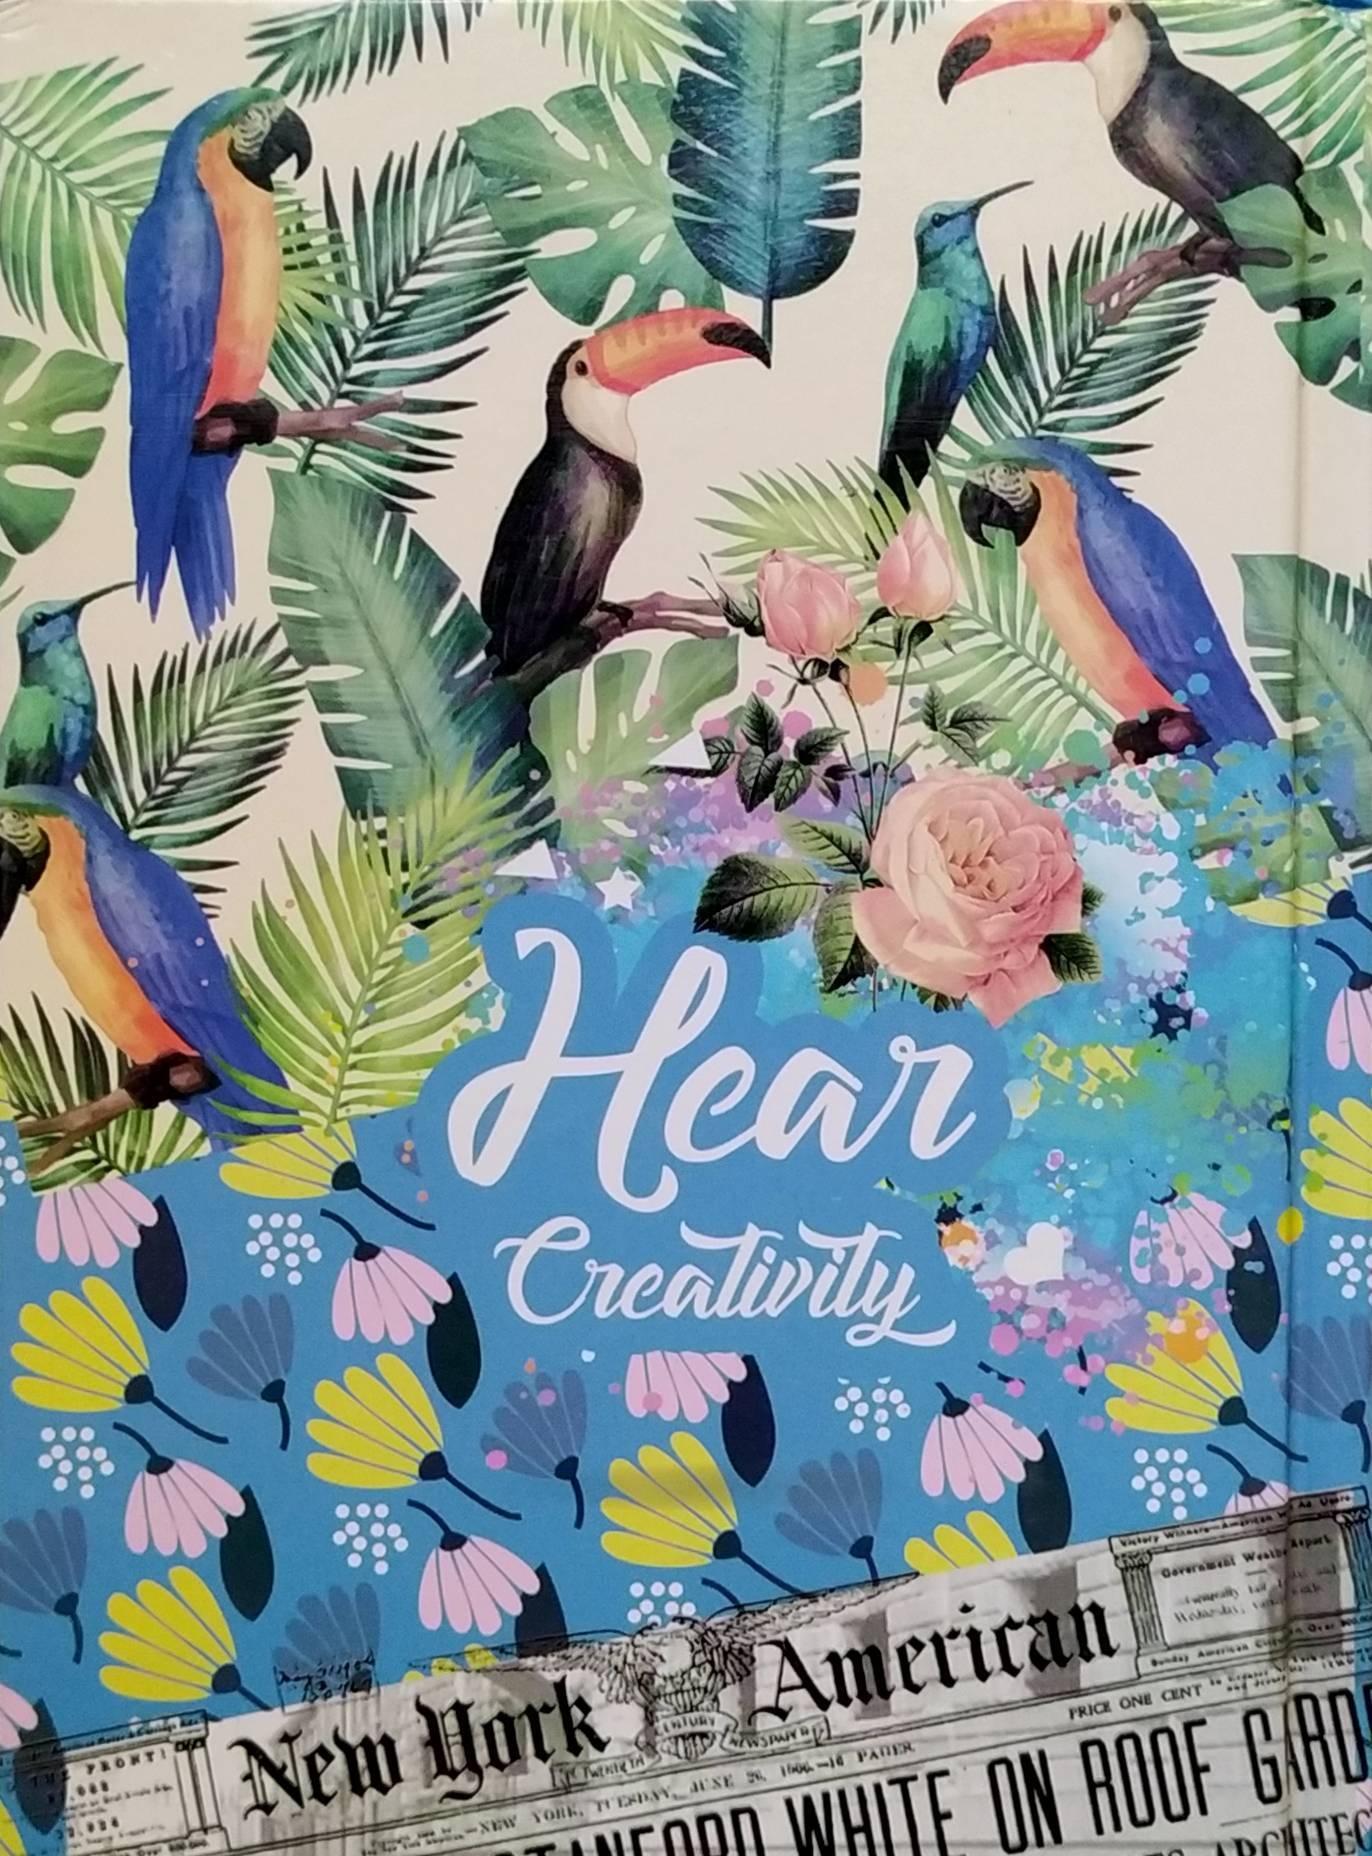 (note book)  Hear Creativity